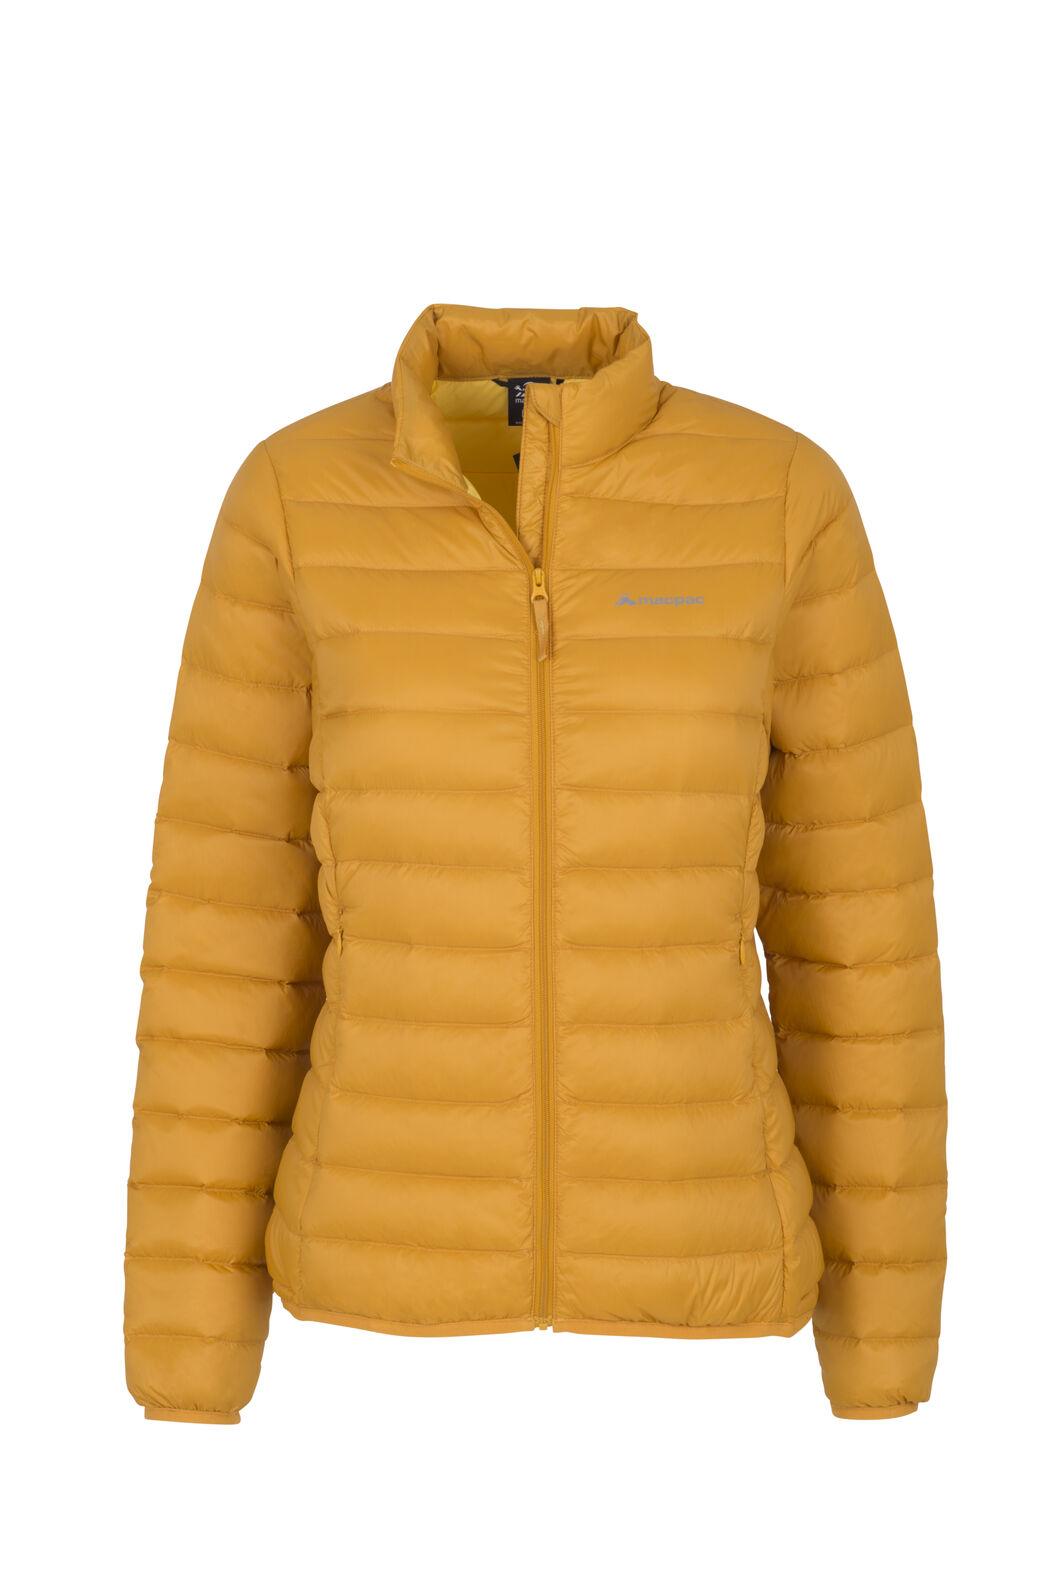 Macpac Uber Light Down Jacket — Women's, Golden Yellow, hi-res